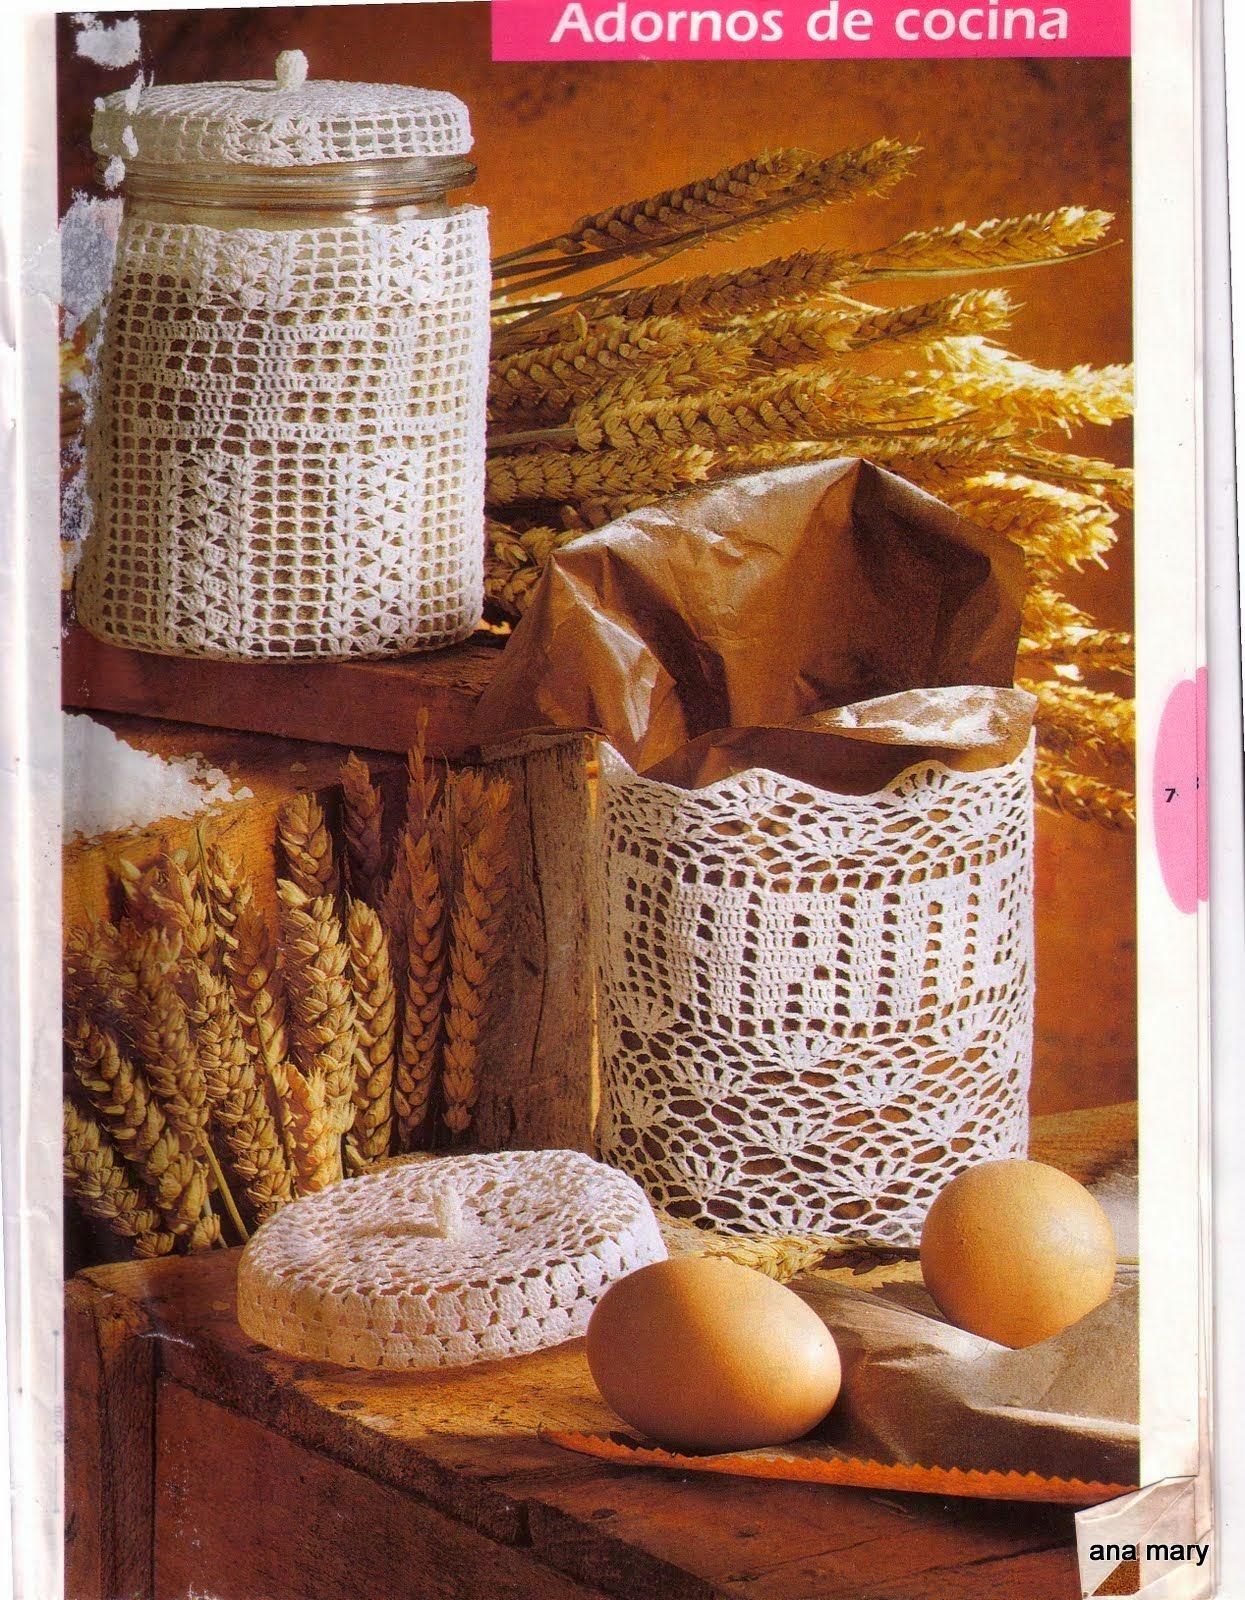 Adornos para la cocina al crochet todo crochet for Adornos para cocina